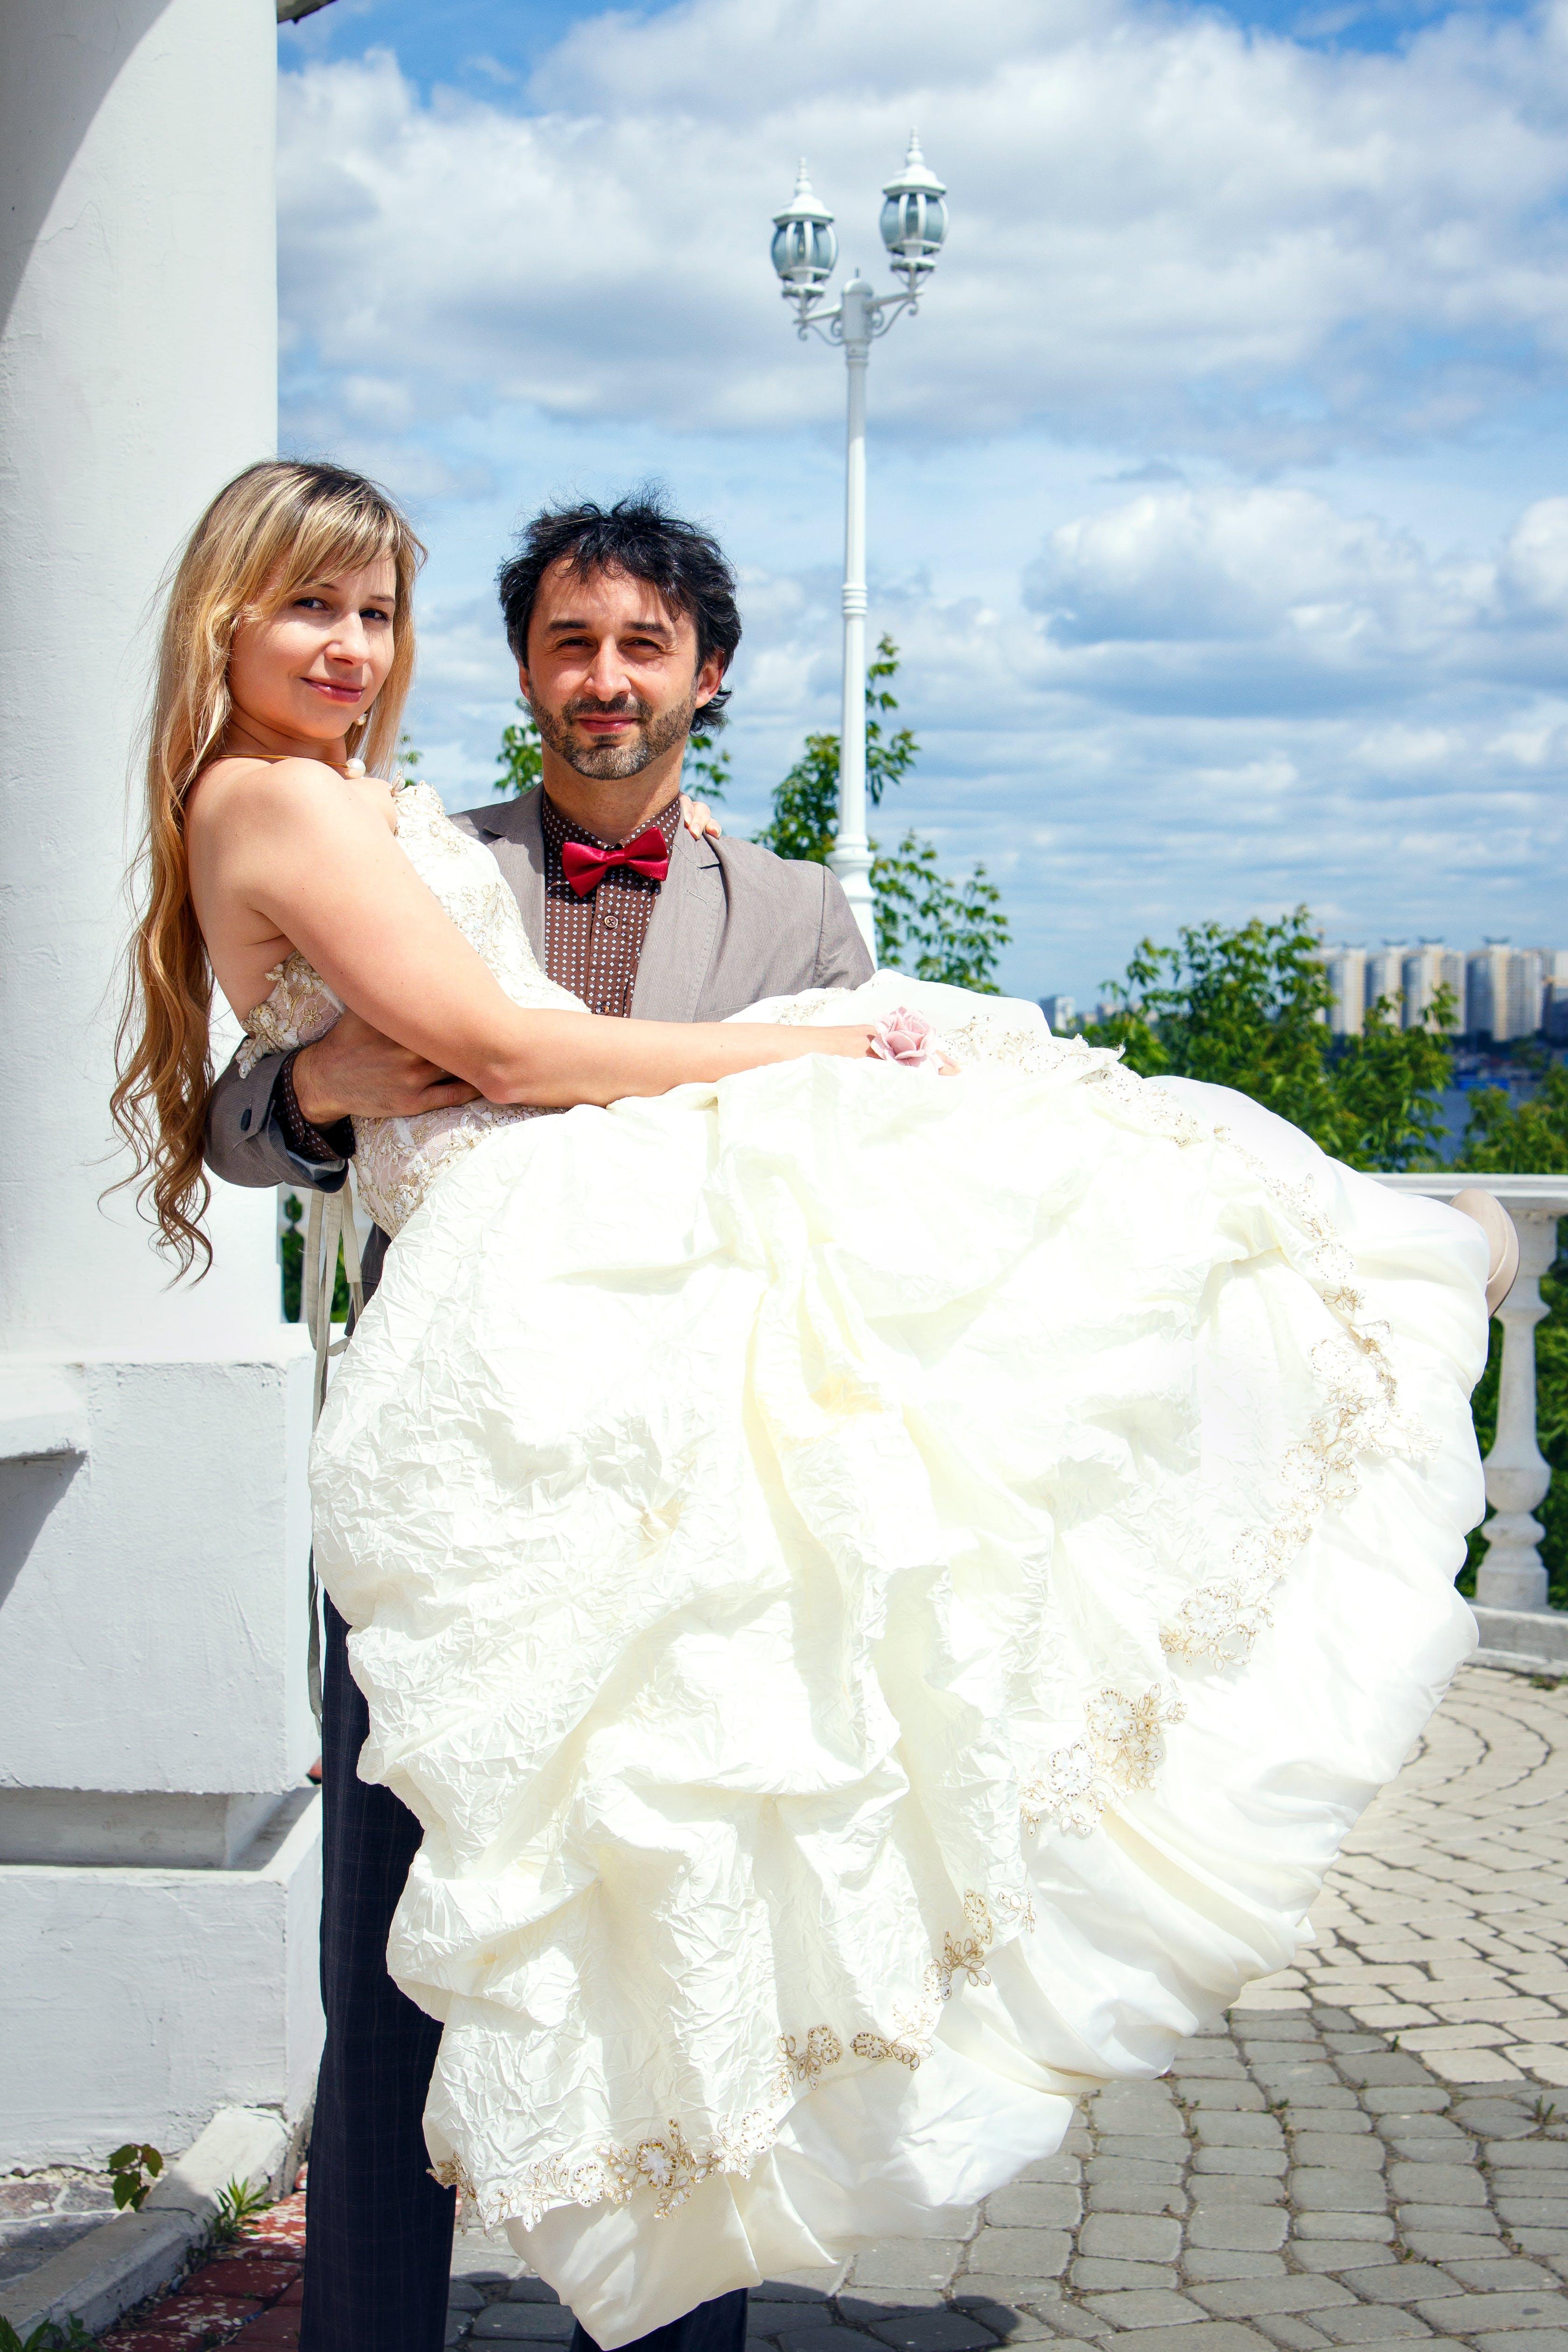 Man Carrying Woman in White Wedding Dress